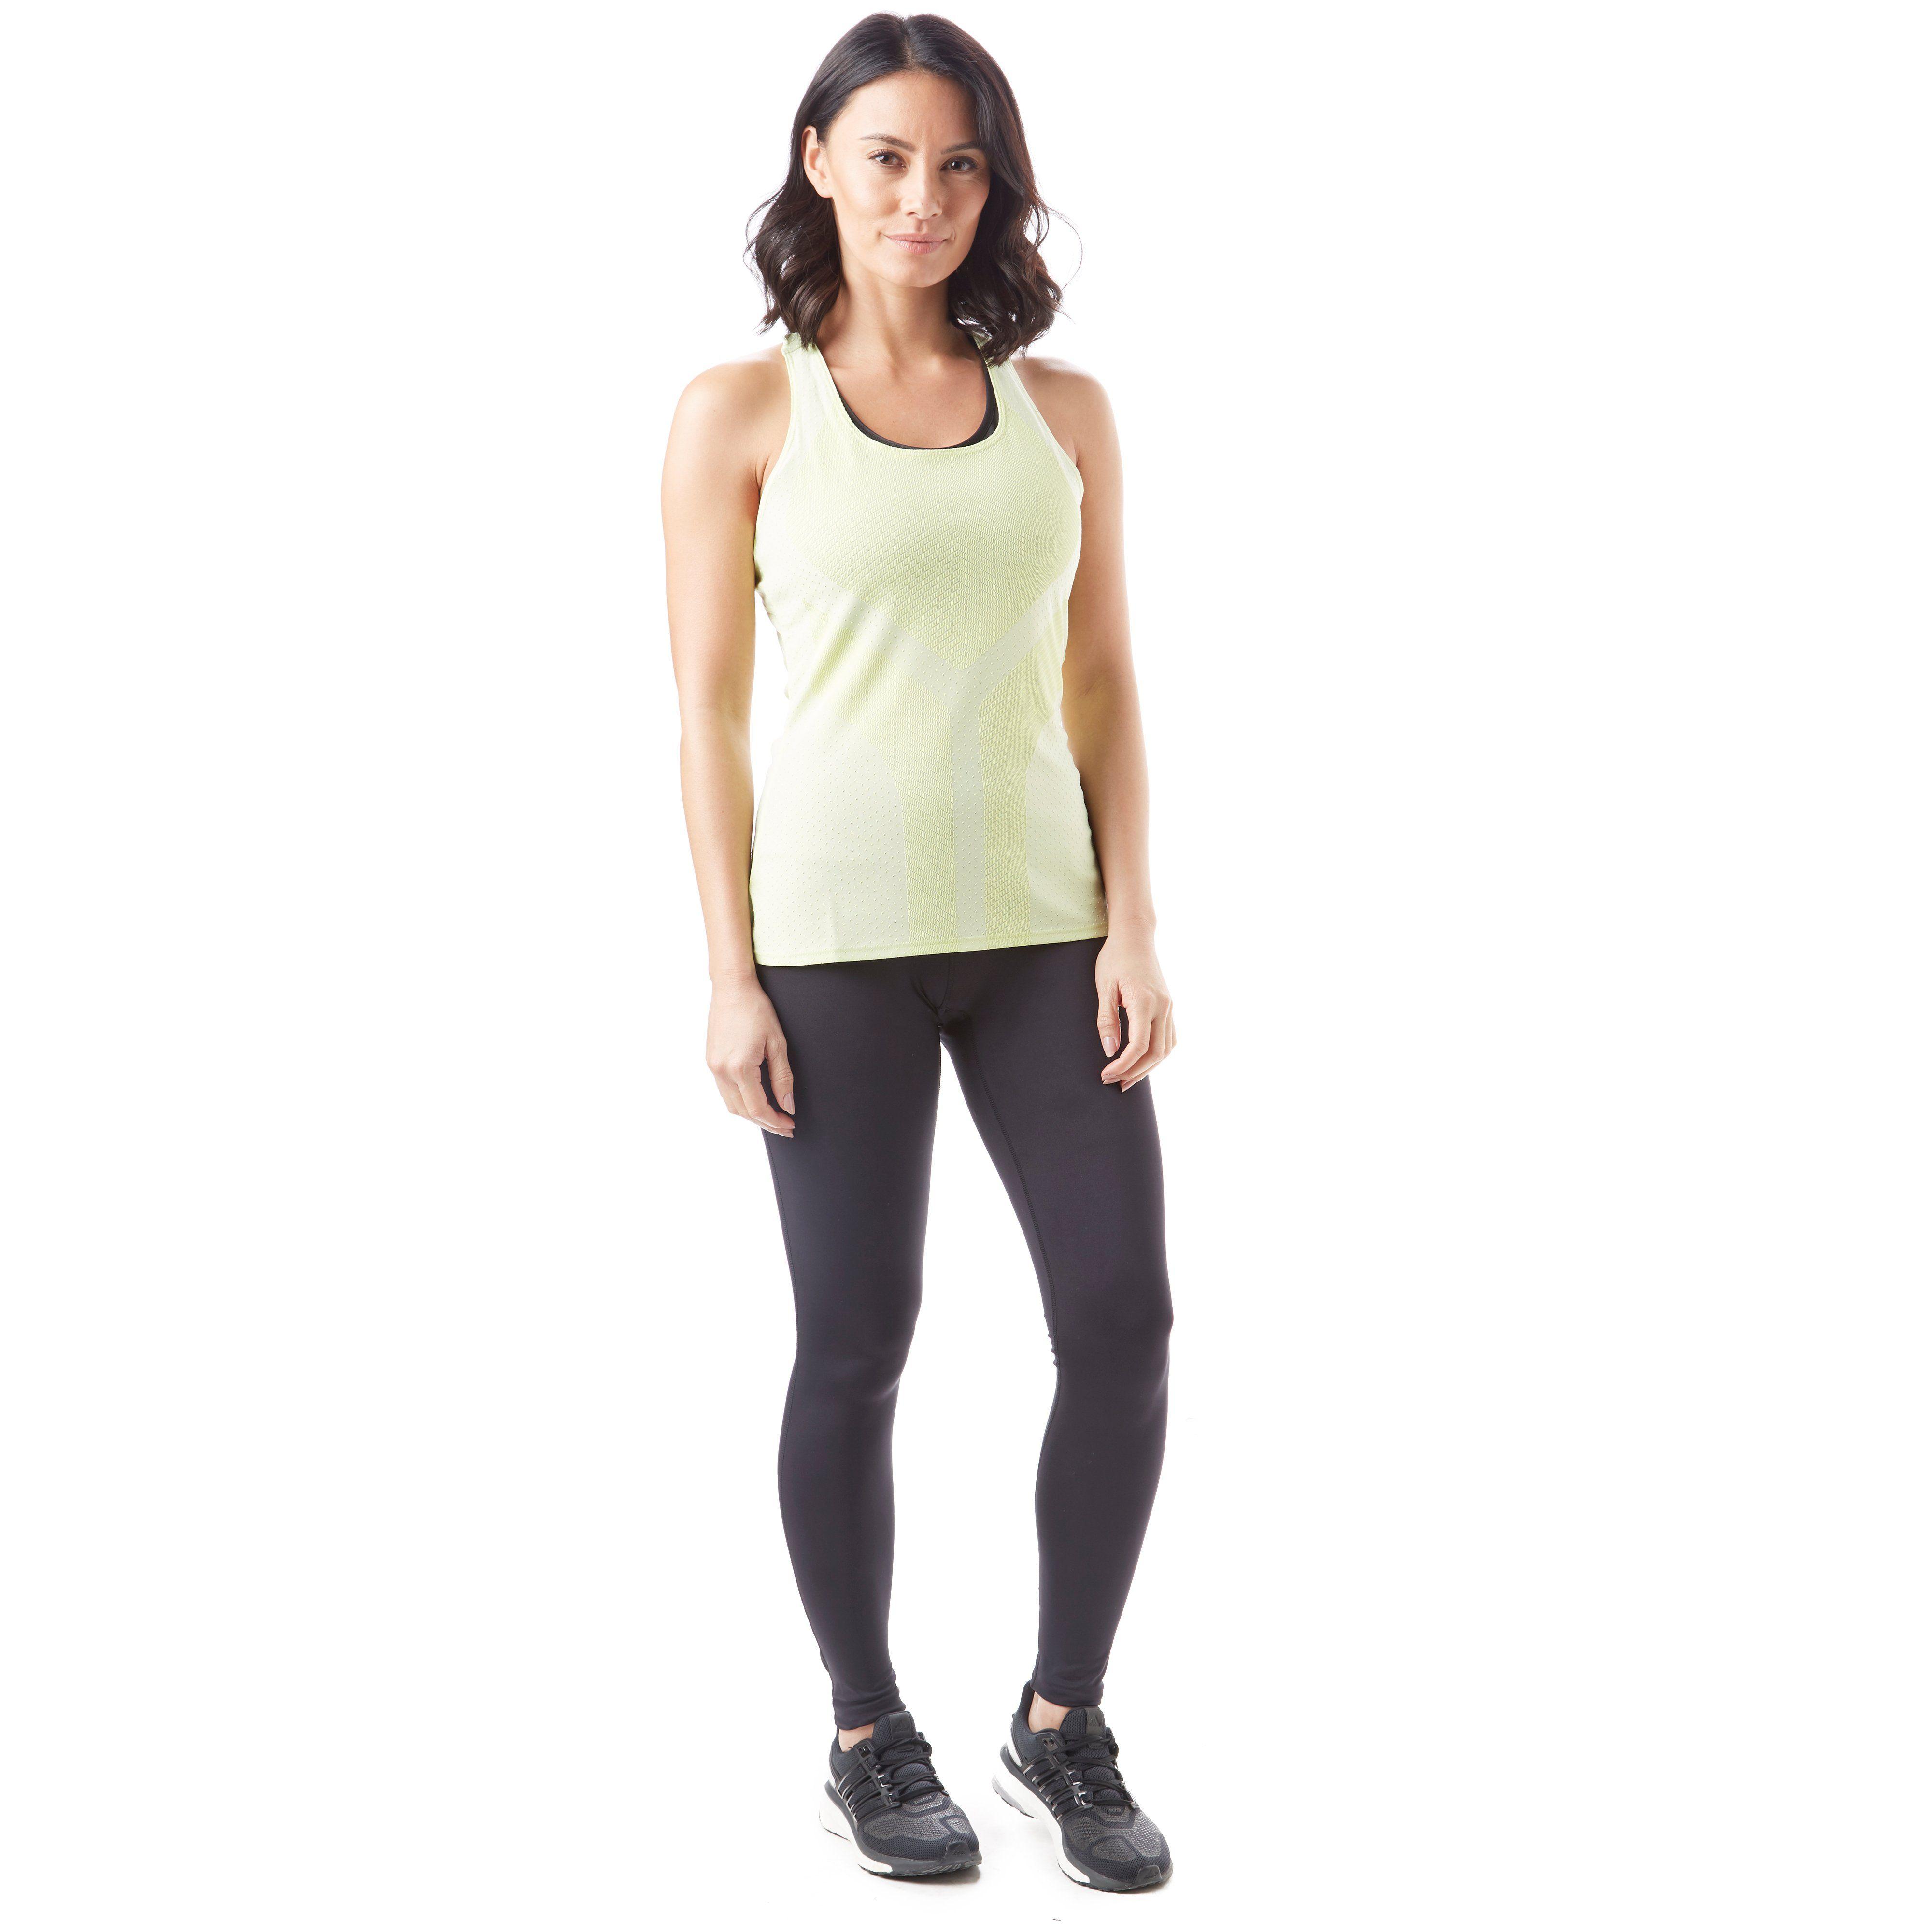 Nike Graphic Women's Training Tank Top